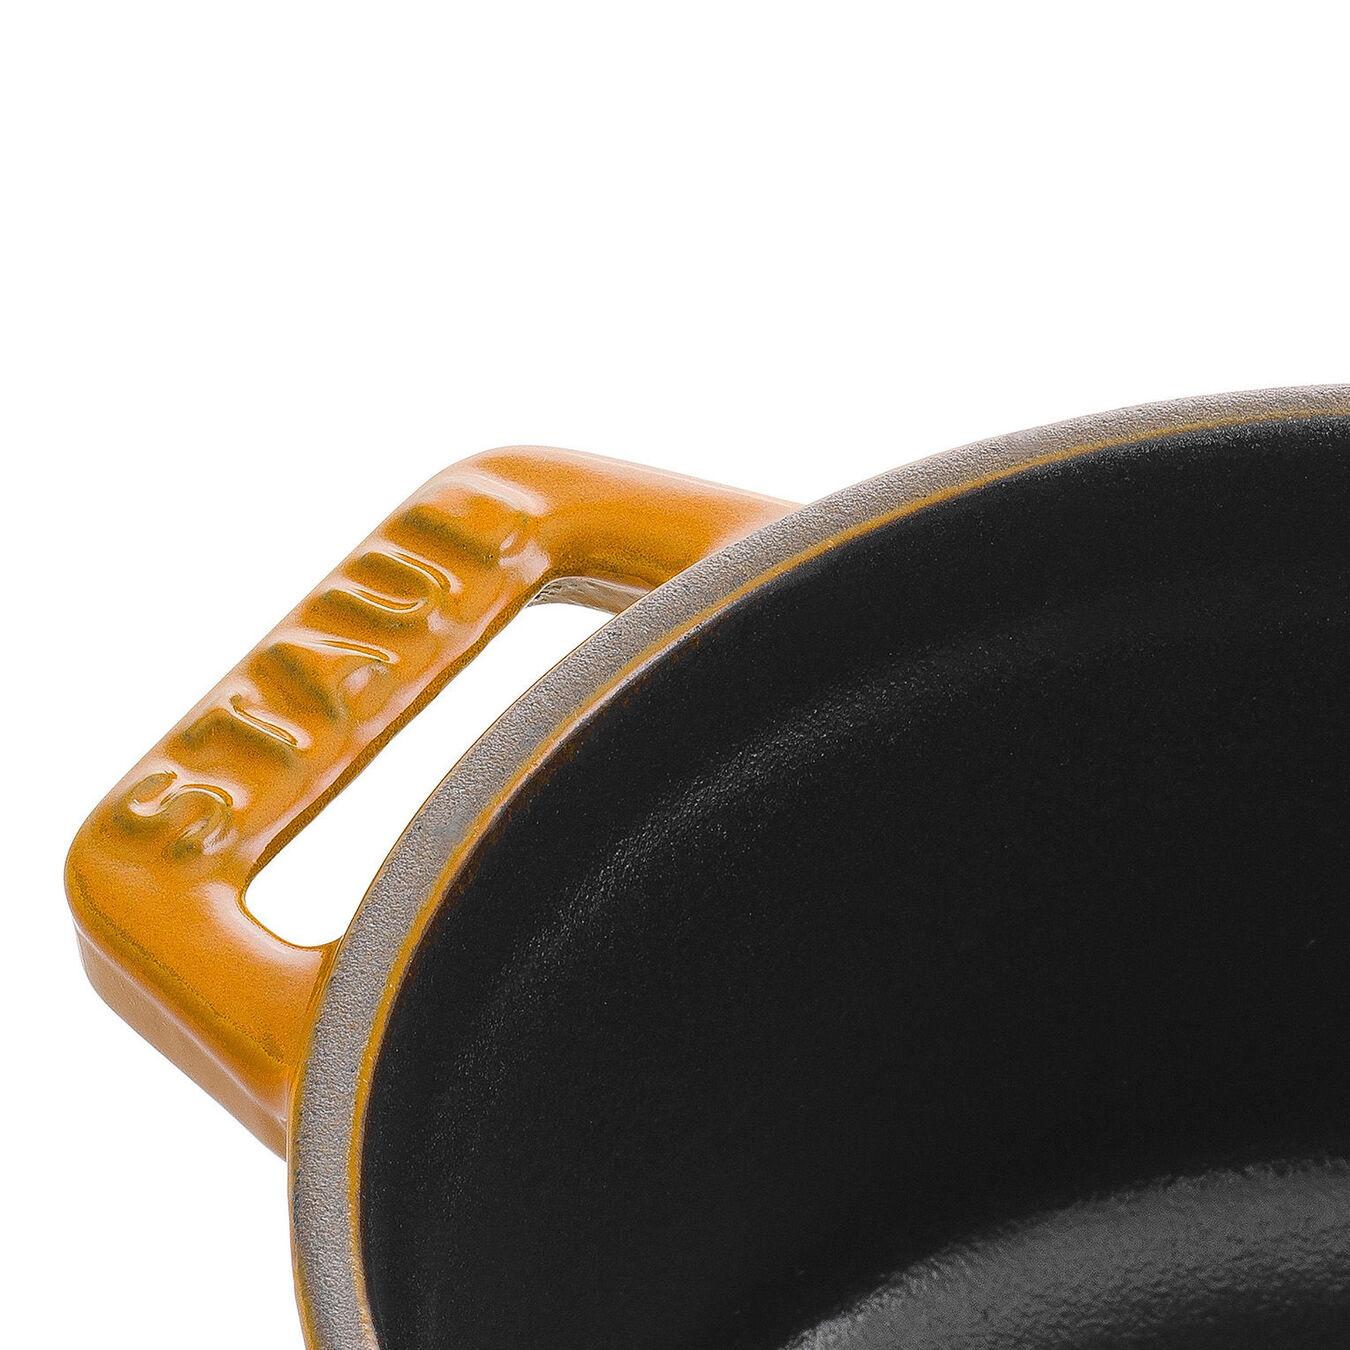 Mini Cocotte 10 cm, Rond(e), Moutarde, Fonte,,large 3